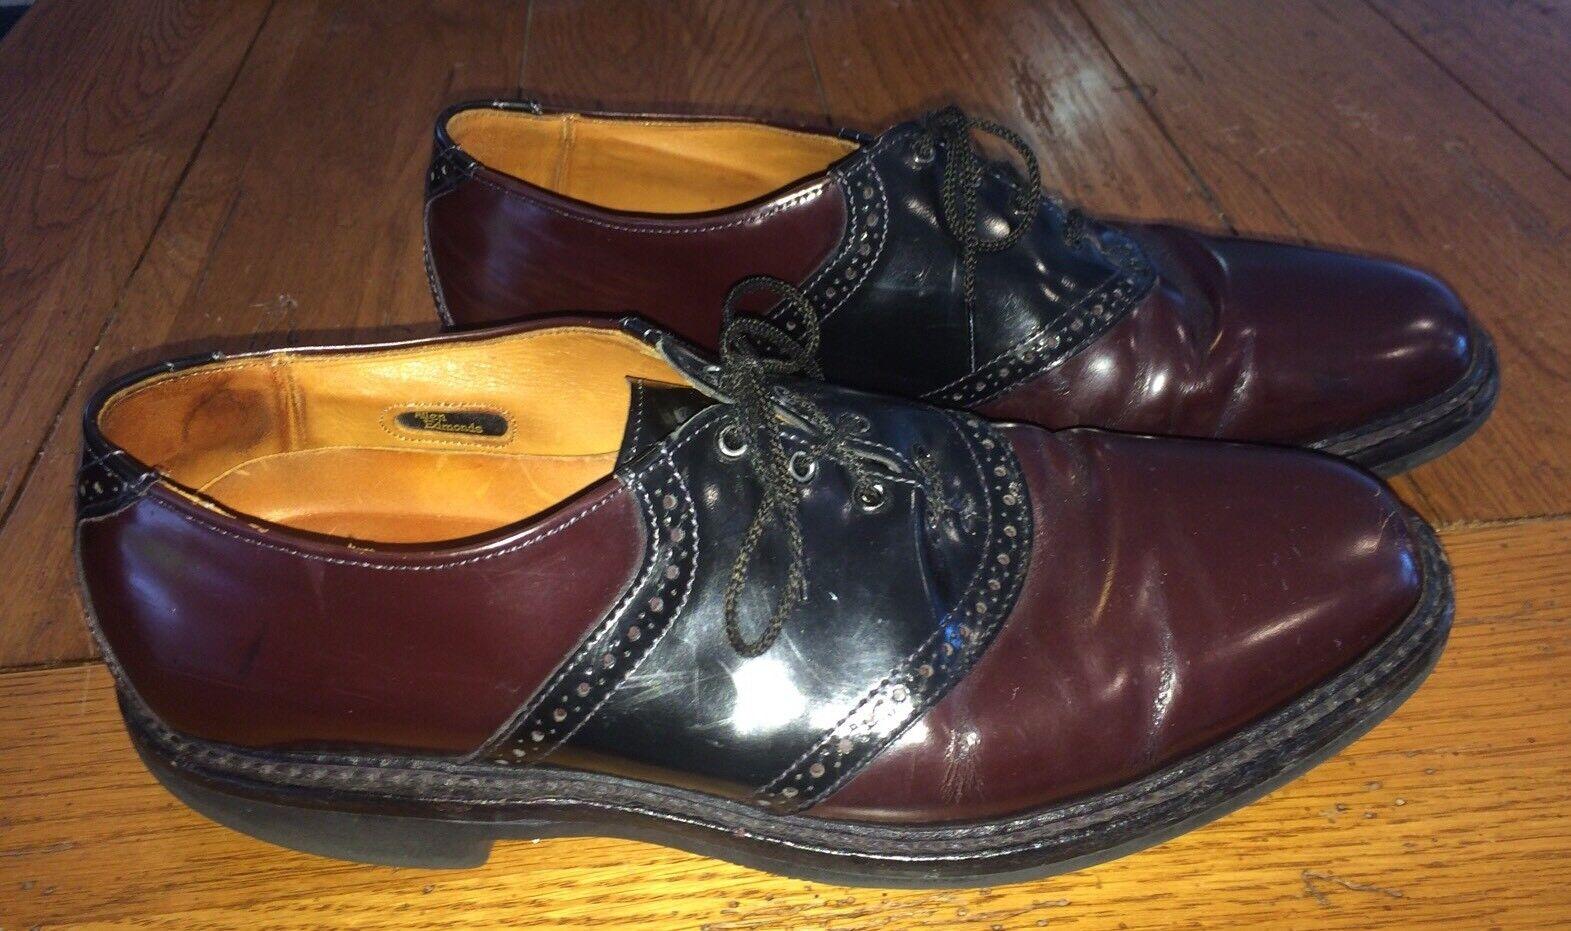 Allen Edmonds Men's 10.5 A  (Narrow) Black & Oxblood Saddle Shoes Shelton X